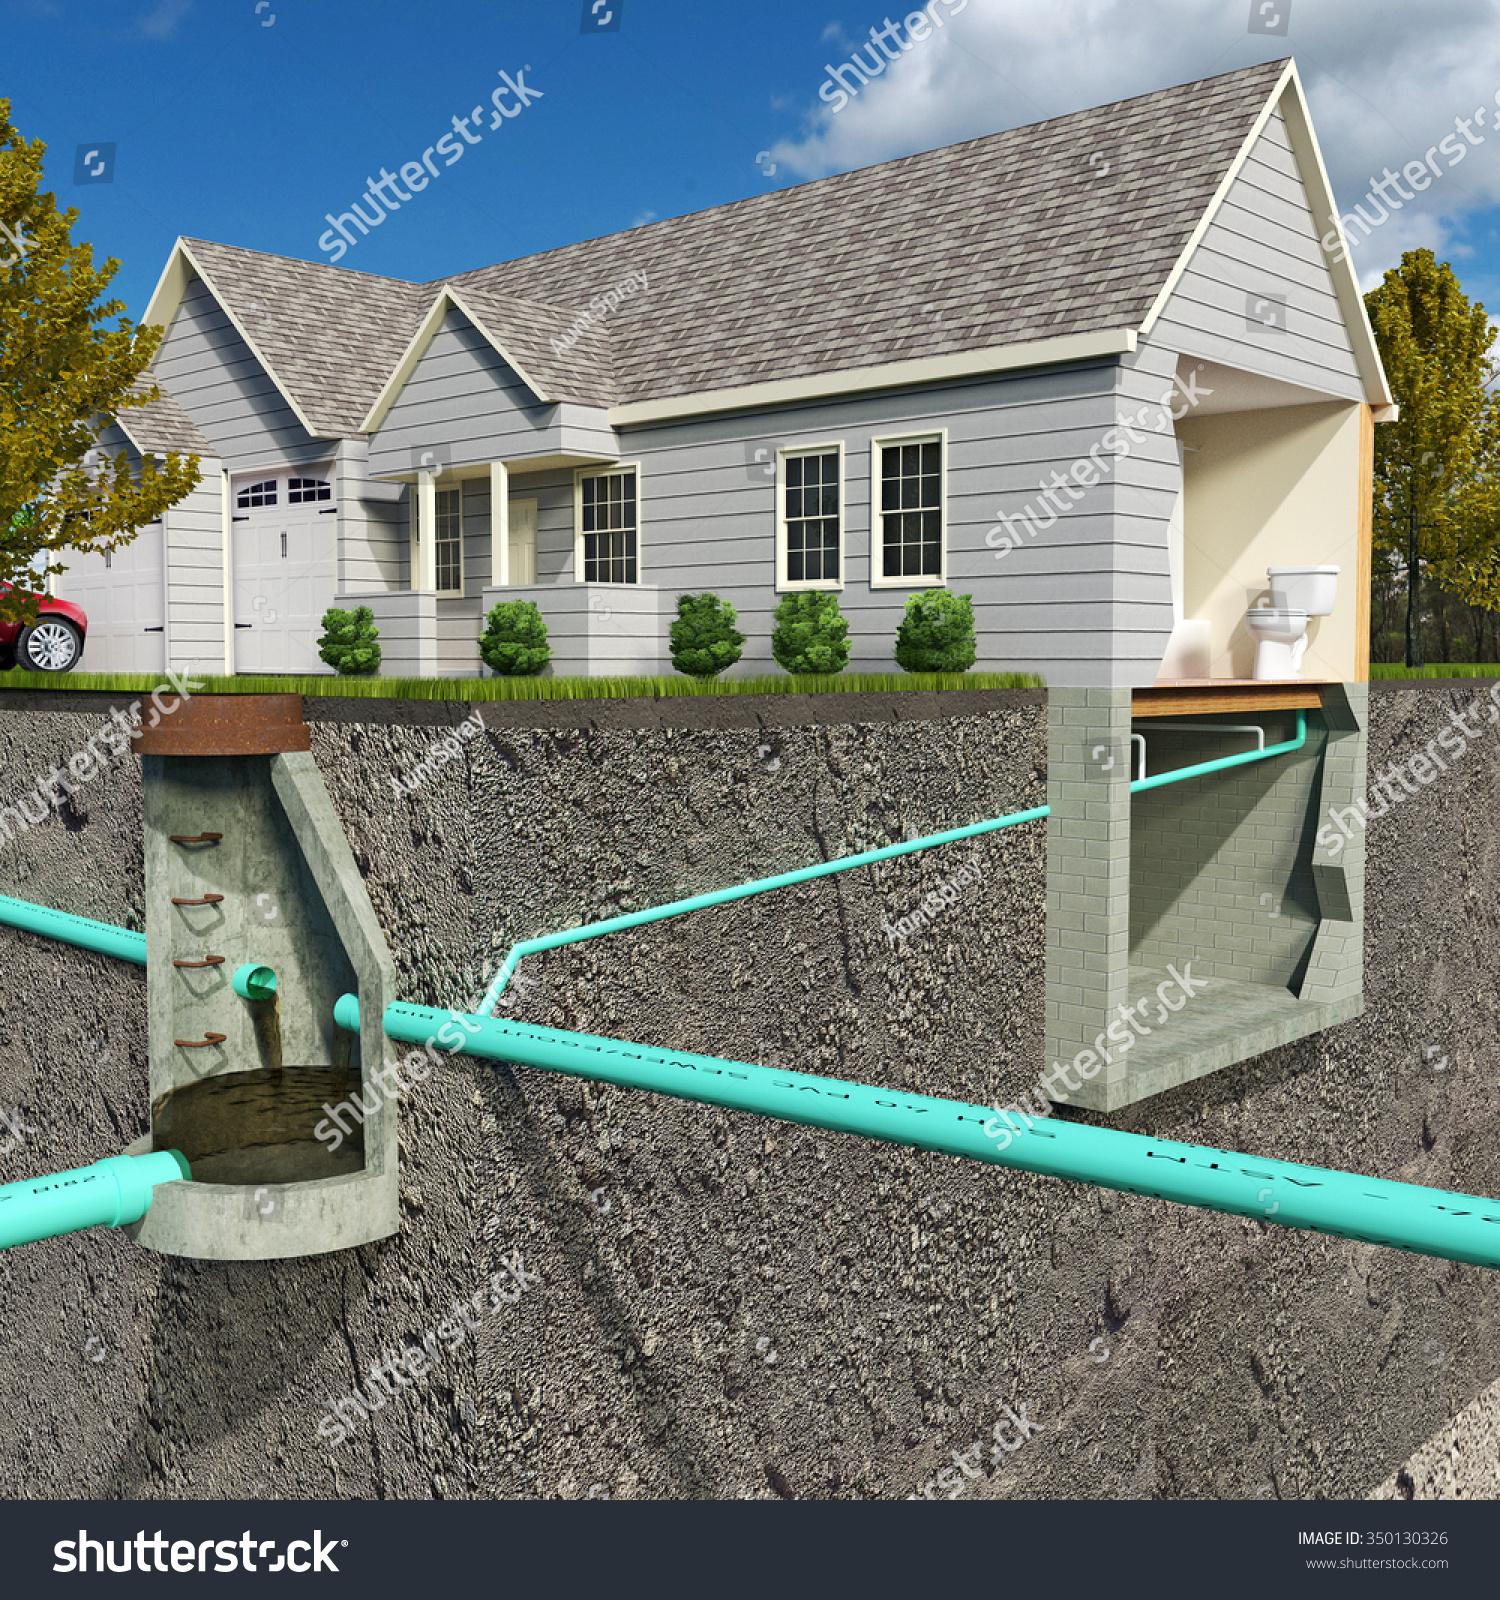 Home Sewer System Design